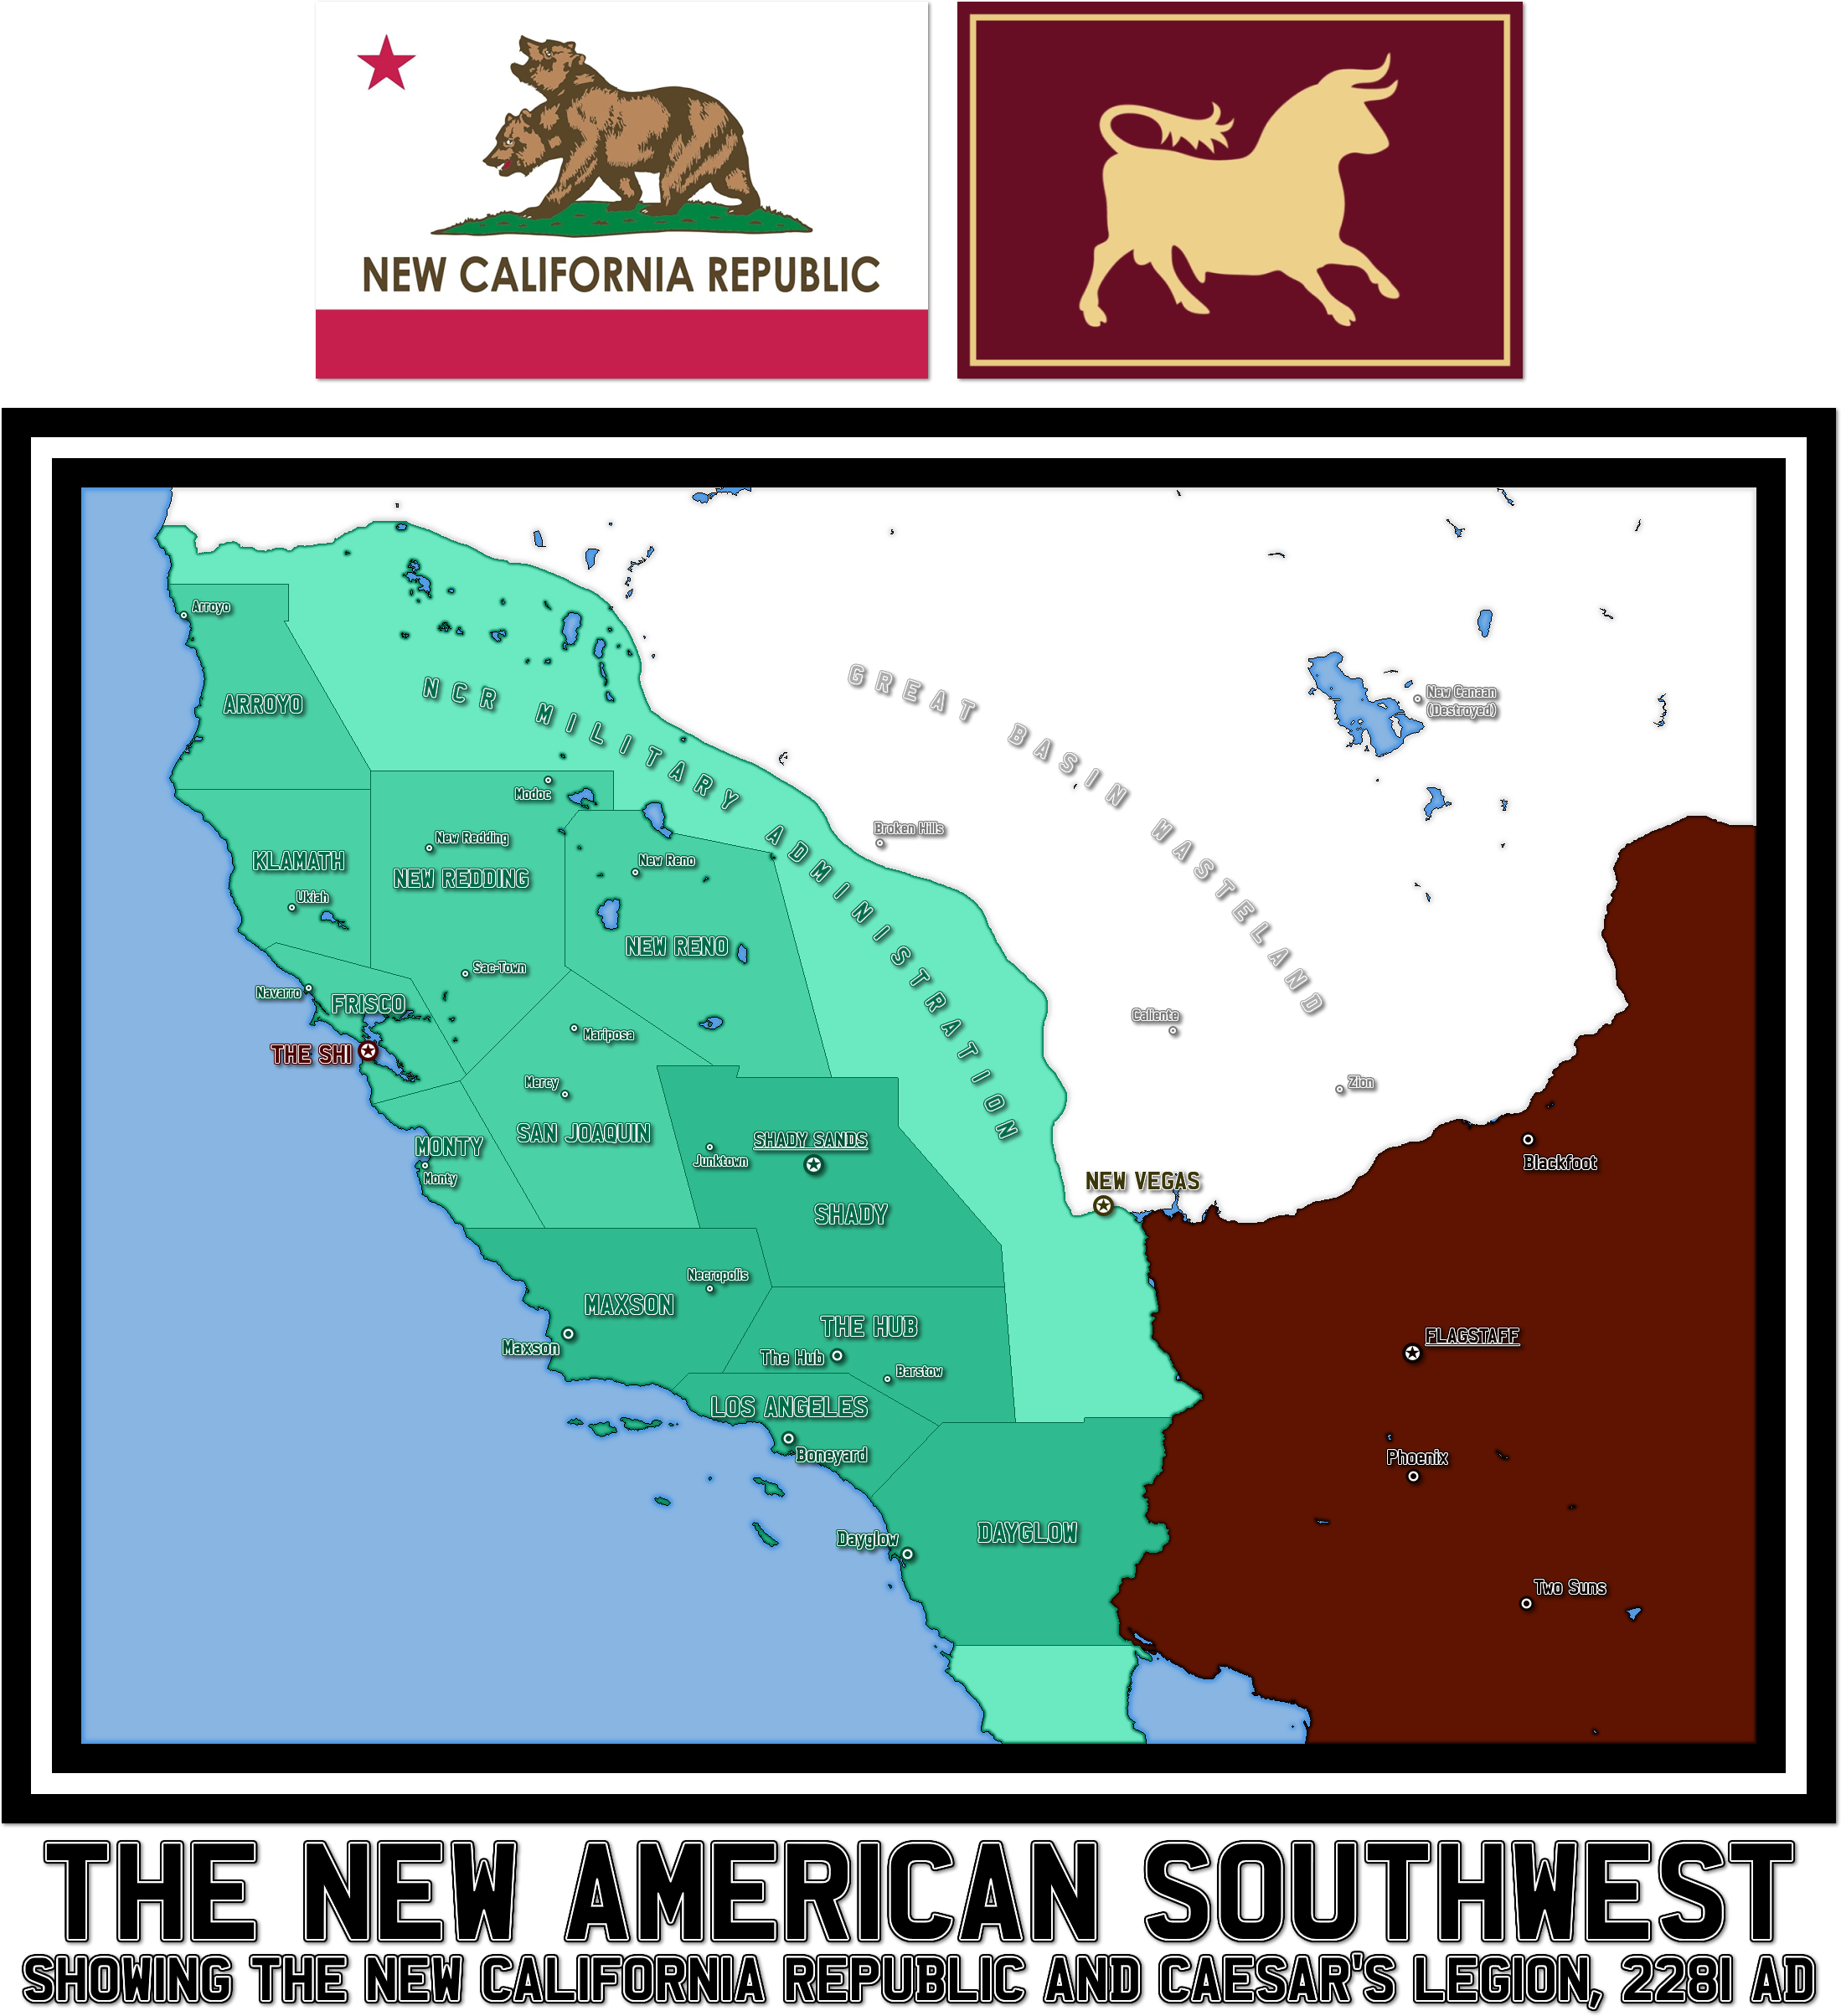 Fallout: New Vegas - The Southwest, 2281